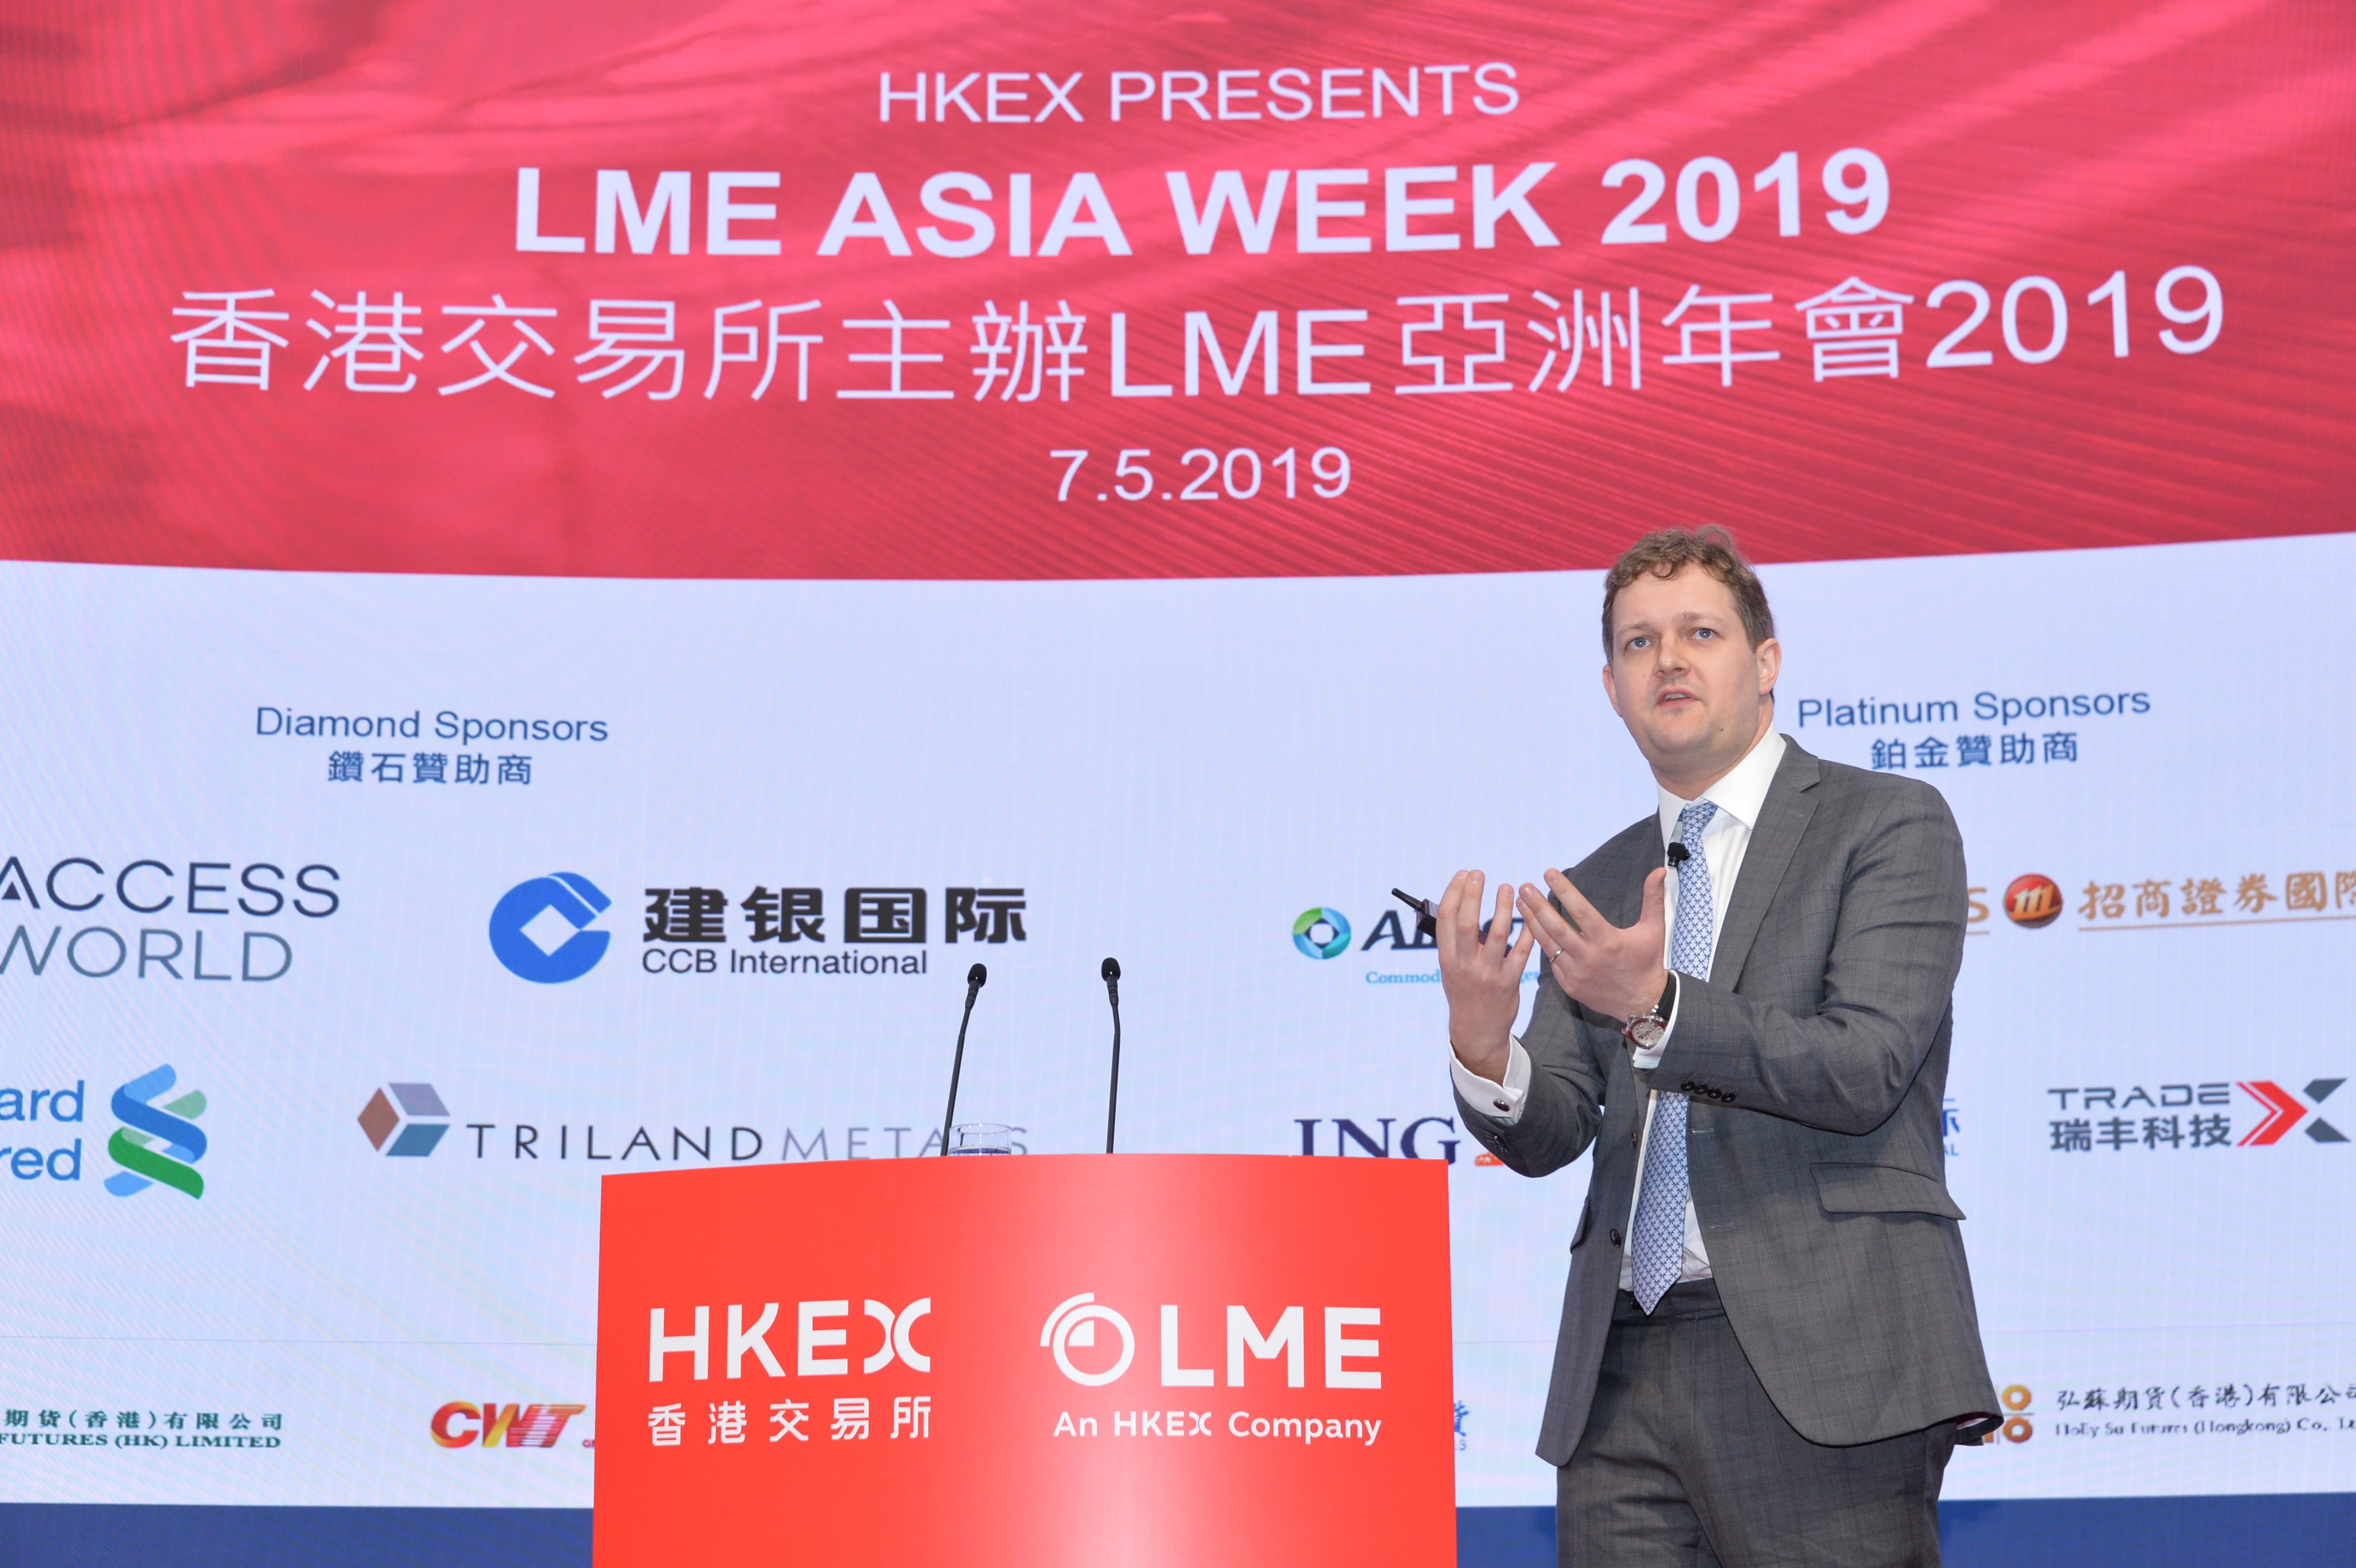 LME Asia Week 2019